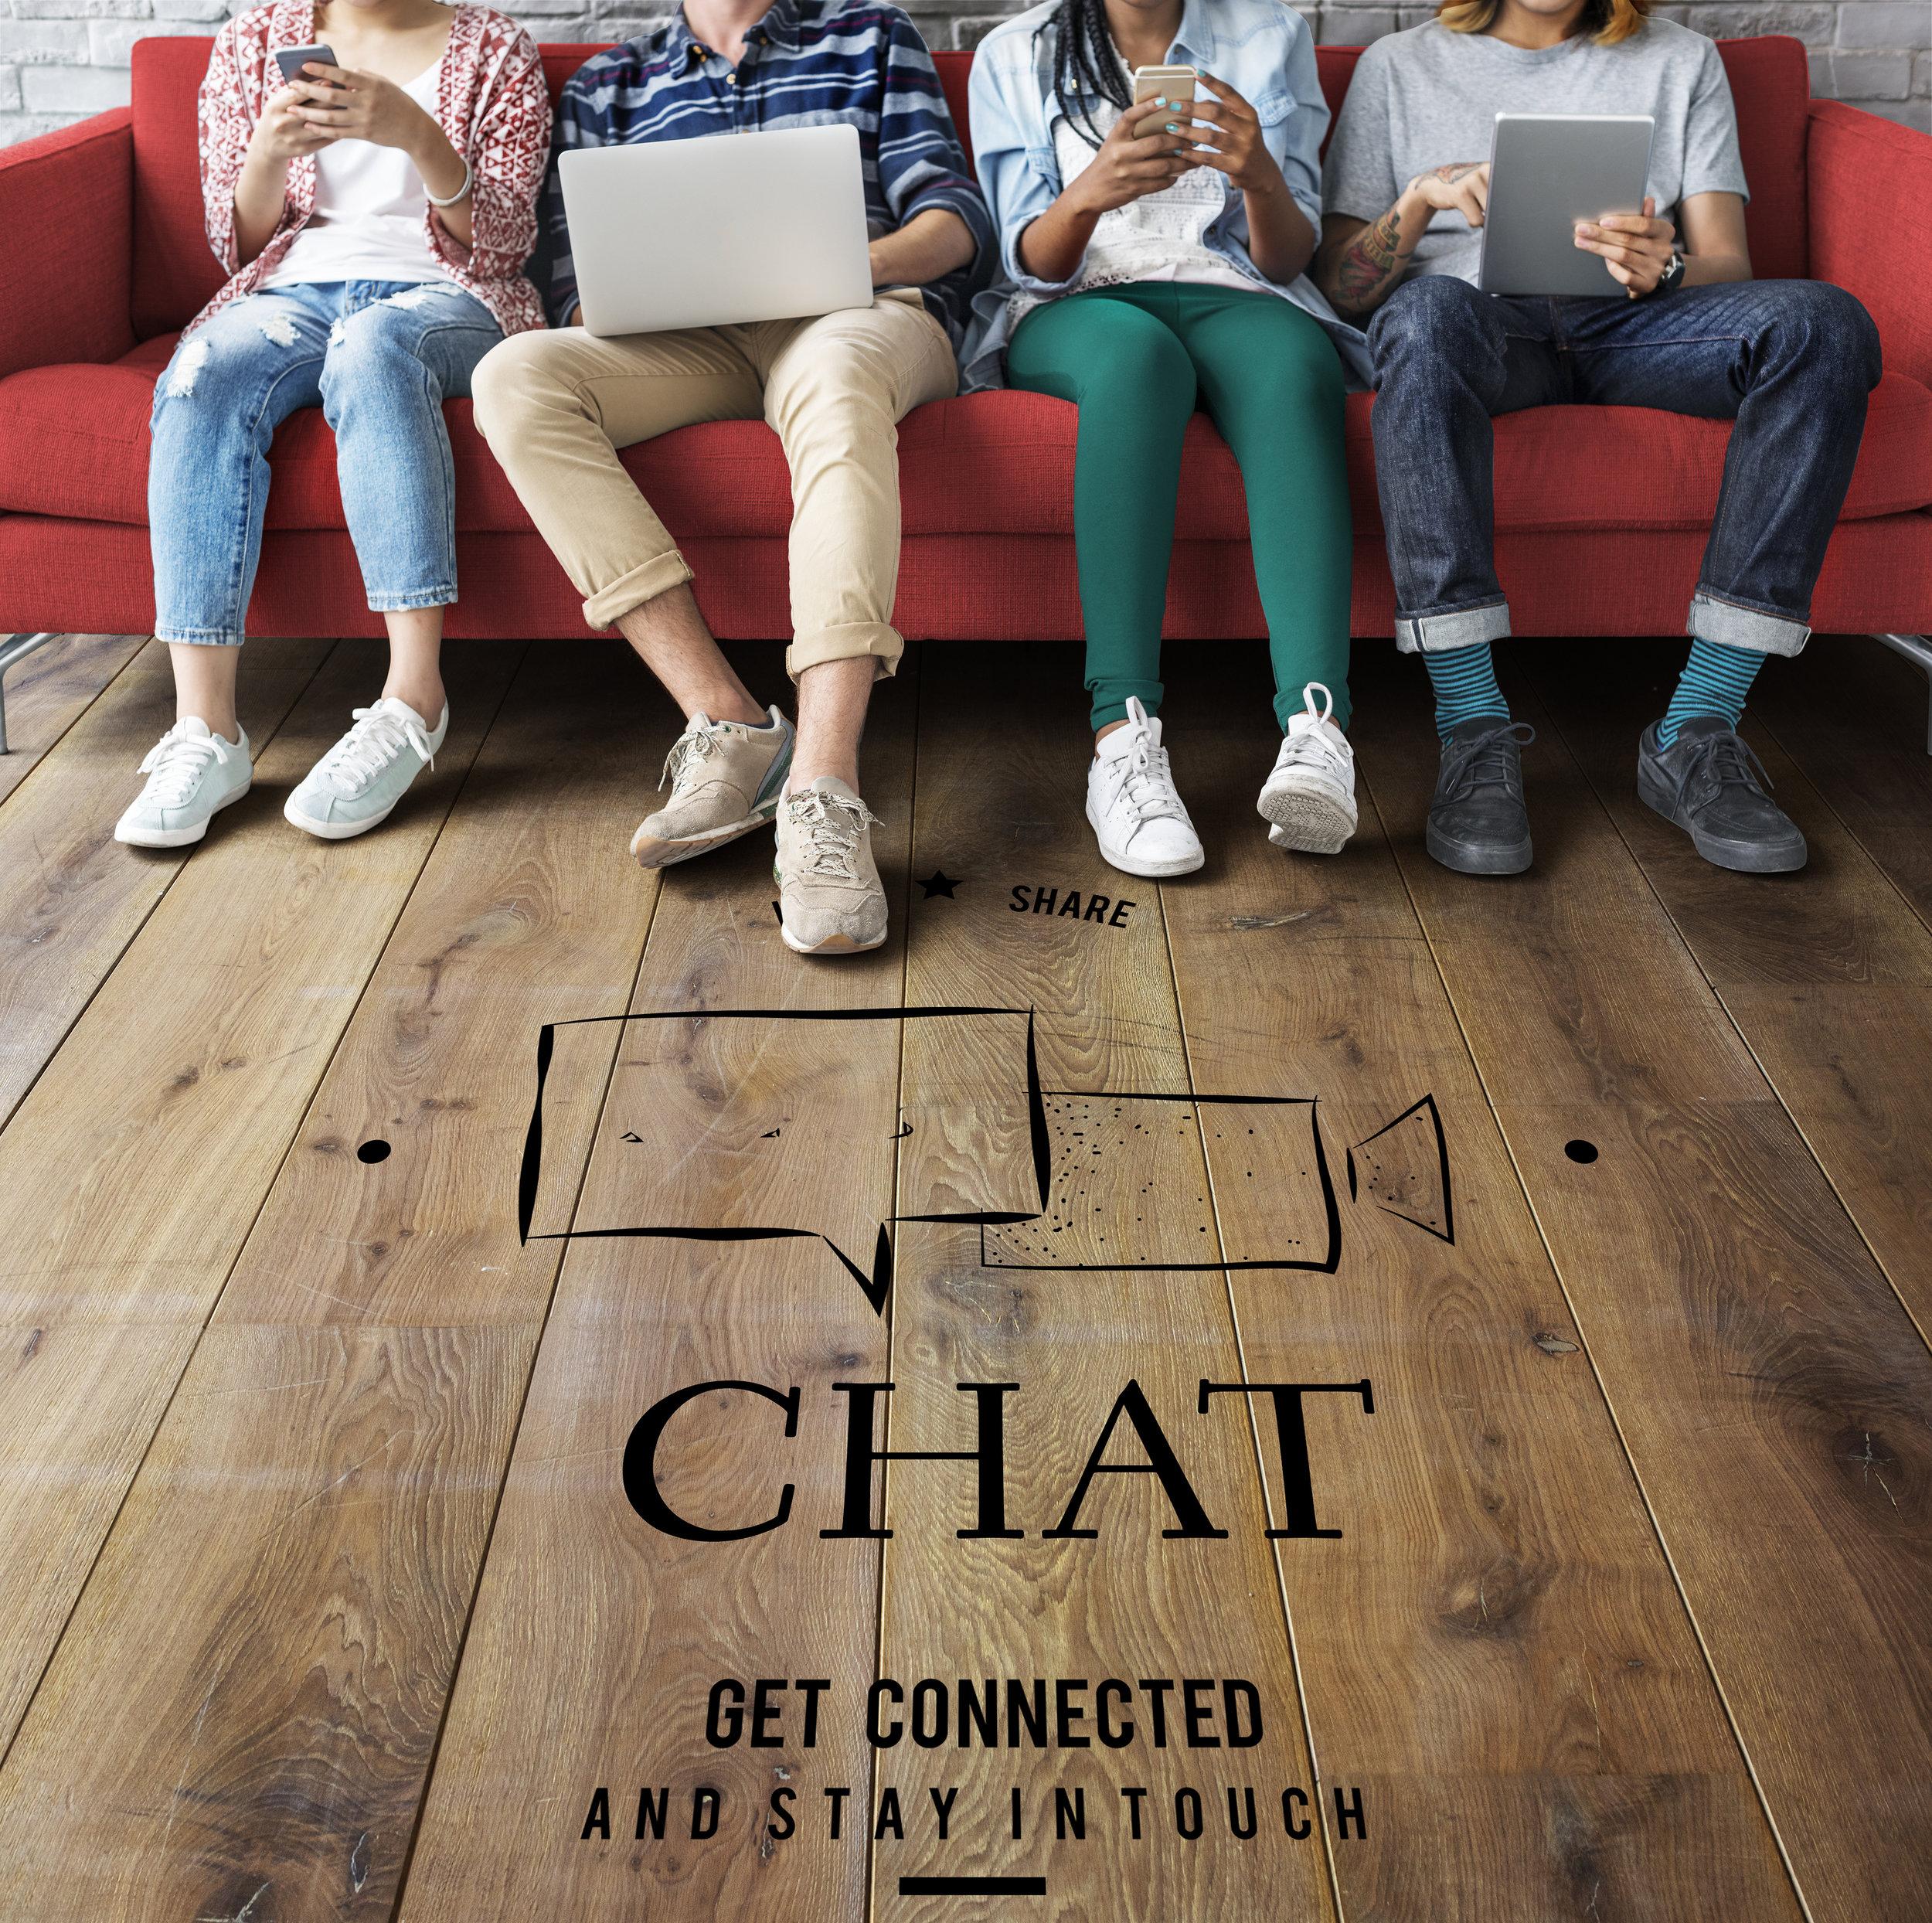 bigstock-Social-Media-Chat-Message-Glob-185770810 copy.jpg